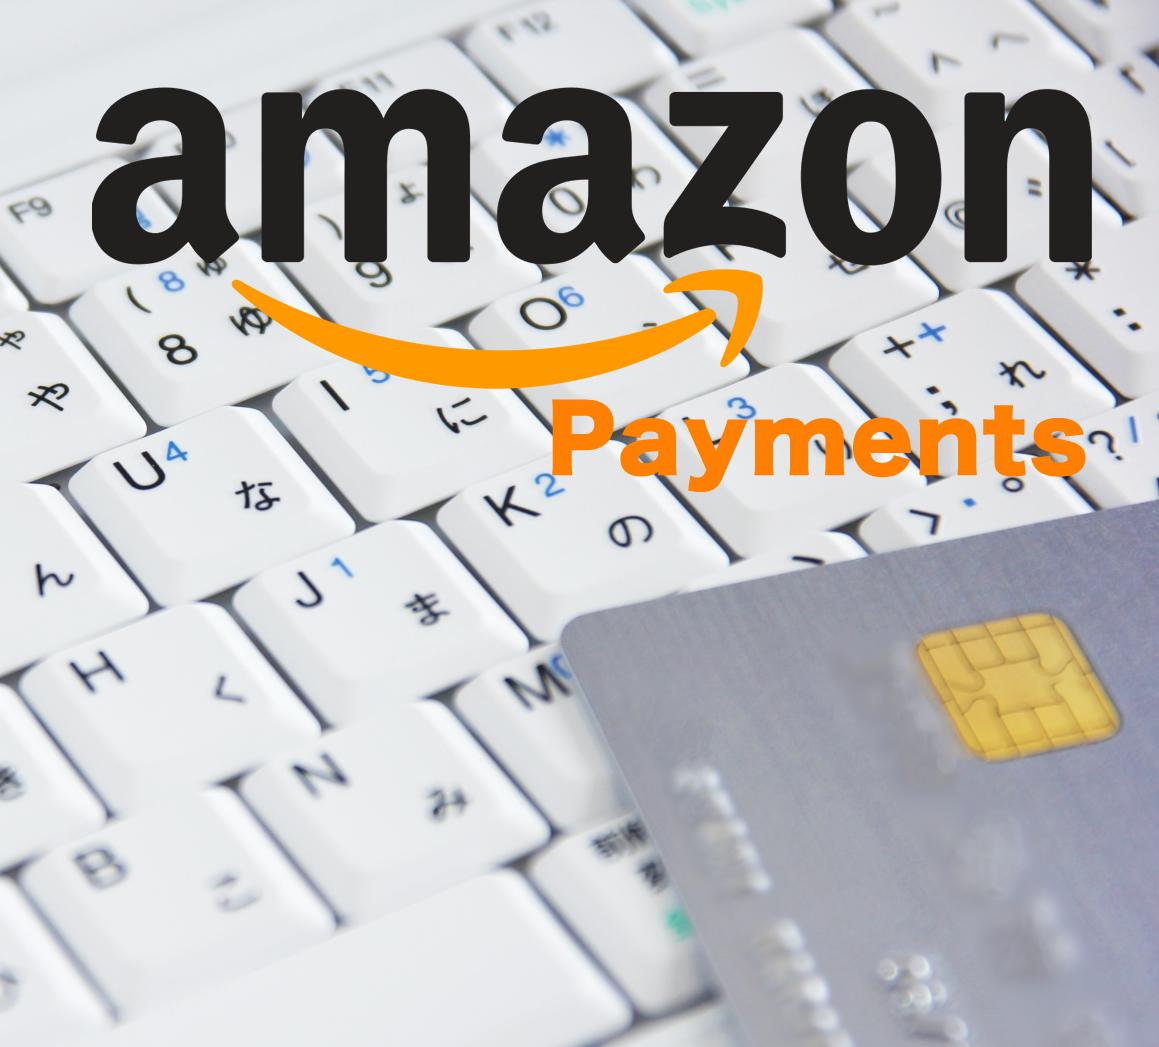 ECサイトが導入すべき決済、Amazonログイン&ペイメントとは?